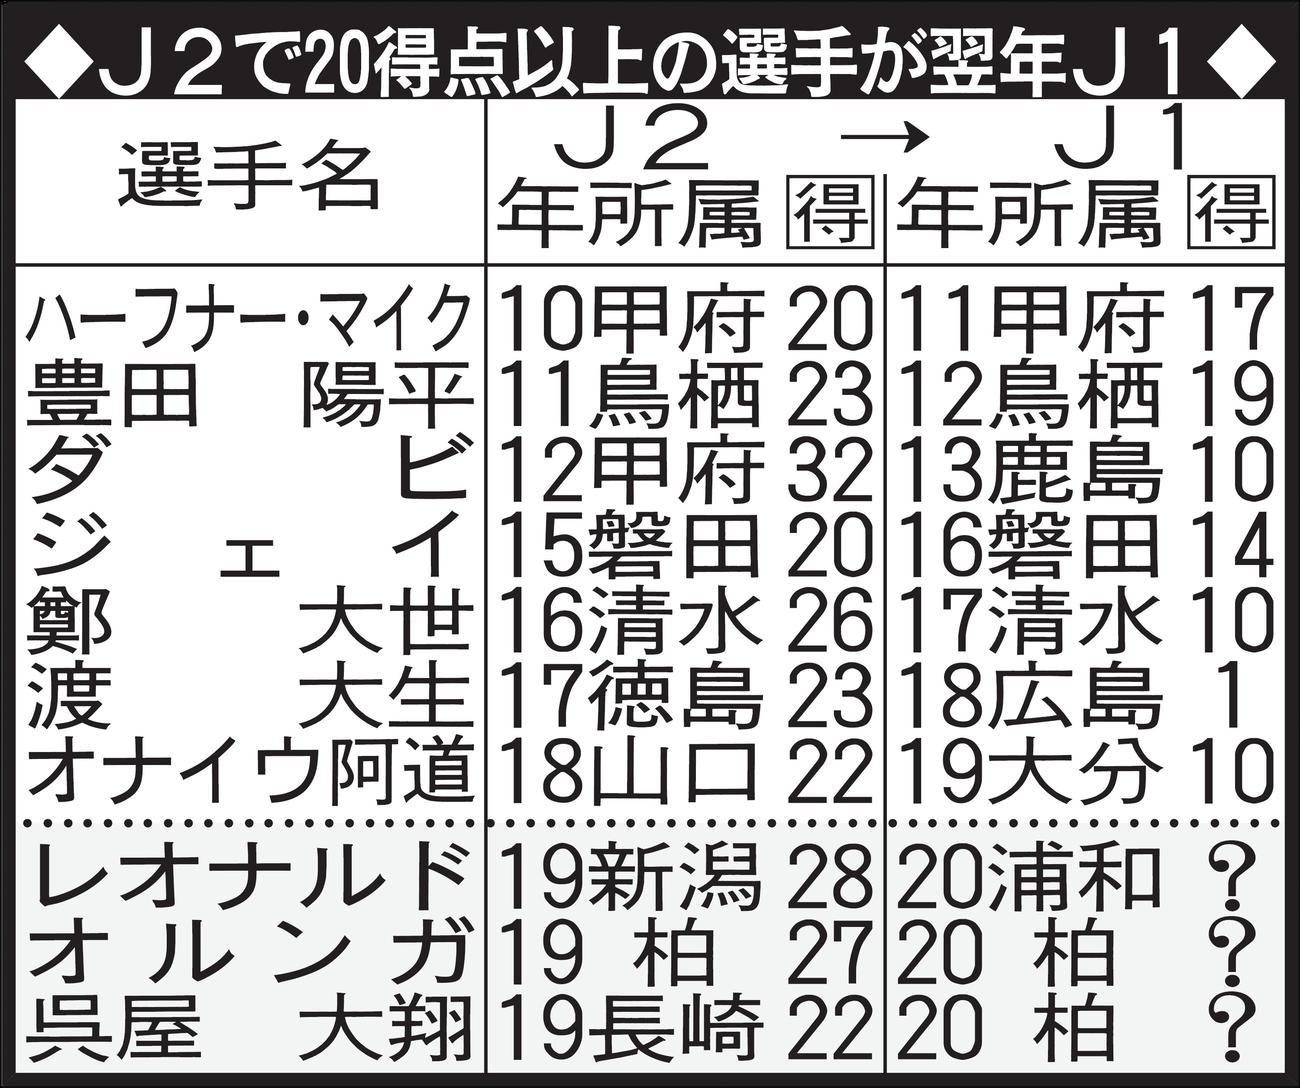 J2で20得点以上の選手が翌年J1